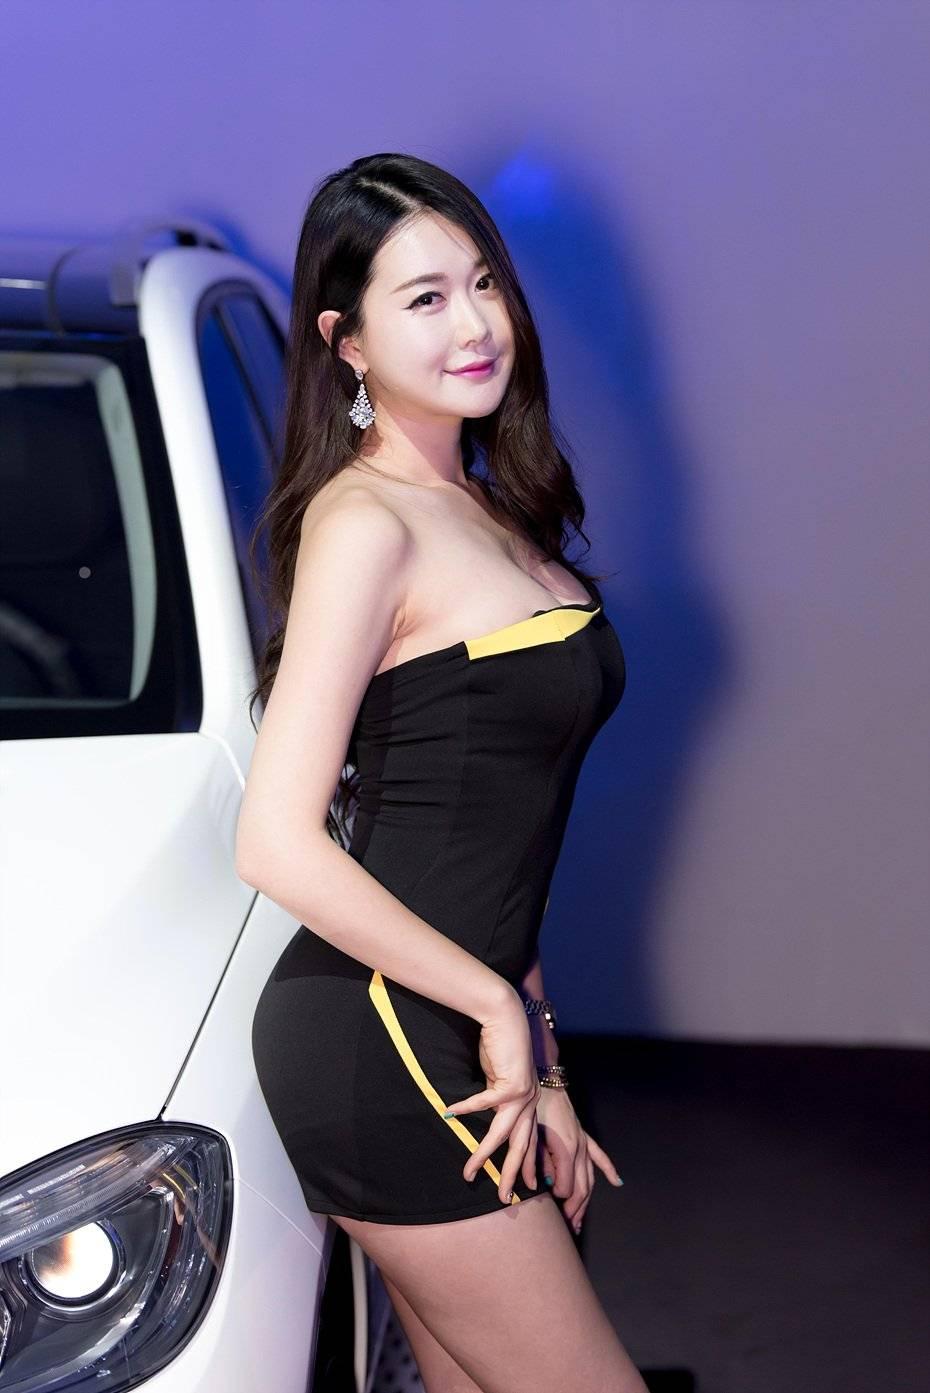 Eun Hayeong   Picture Gallery  HanCinema  The Korean Movie and Drama Database